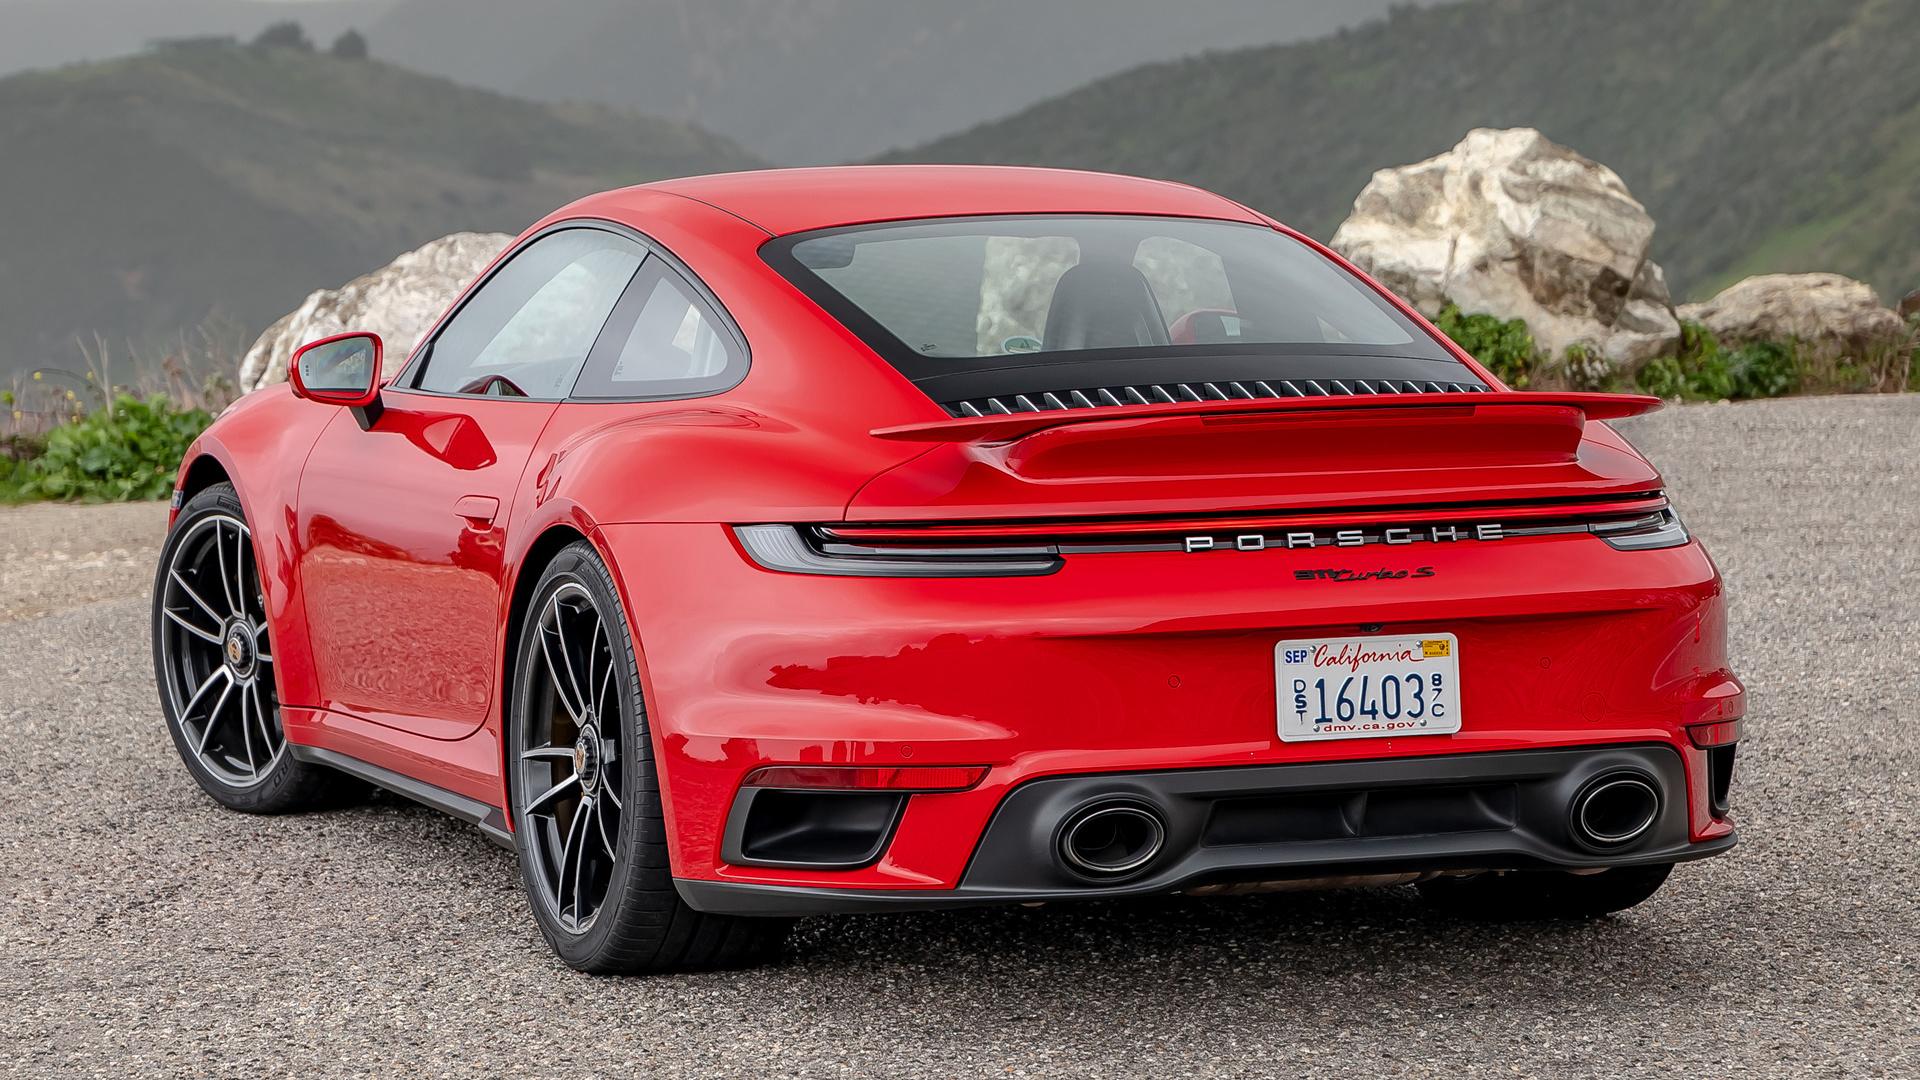 2020 Porsche 911 Turbo S Hd Wallpaper Background Image